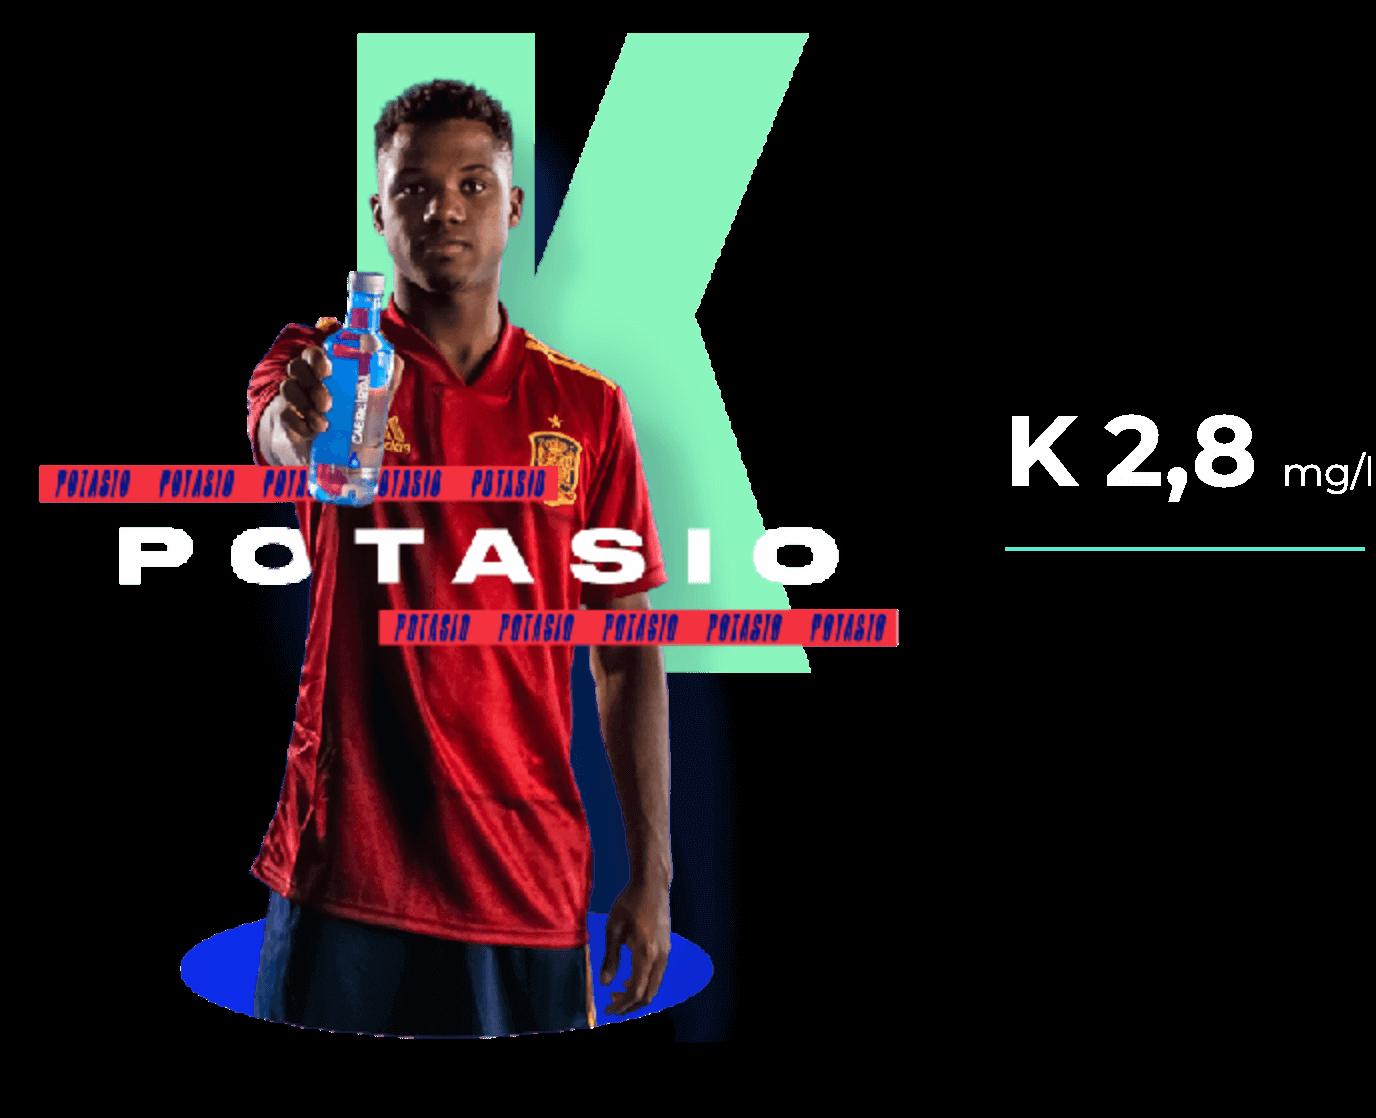 Potasio K 3,8 MG/L